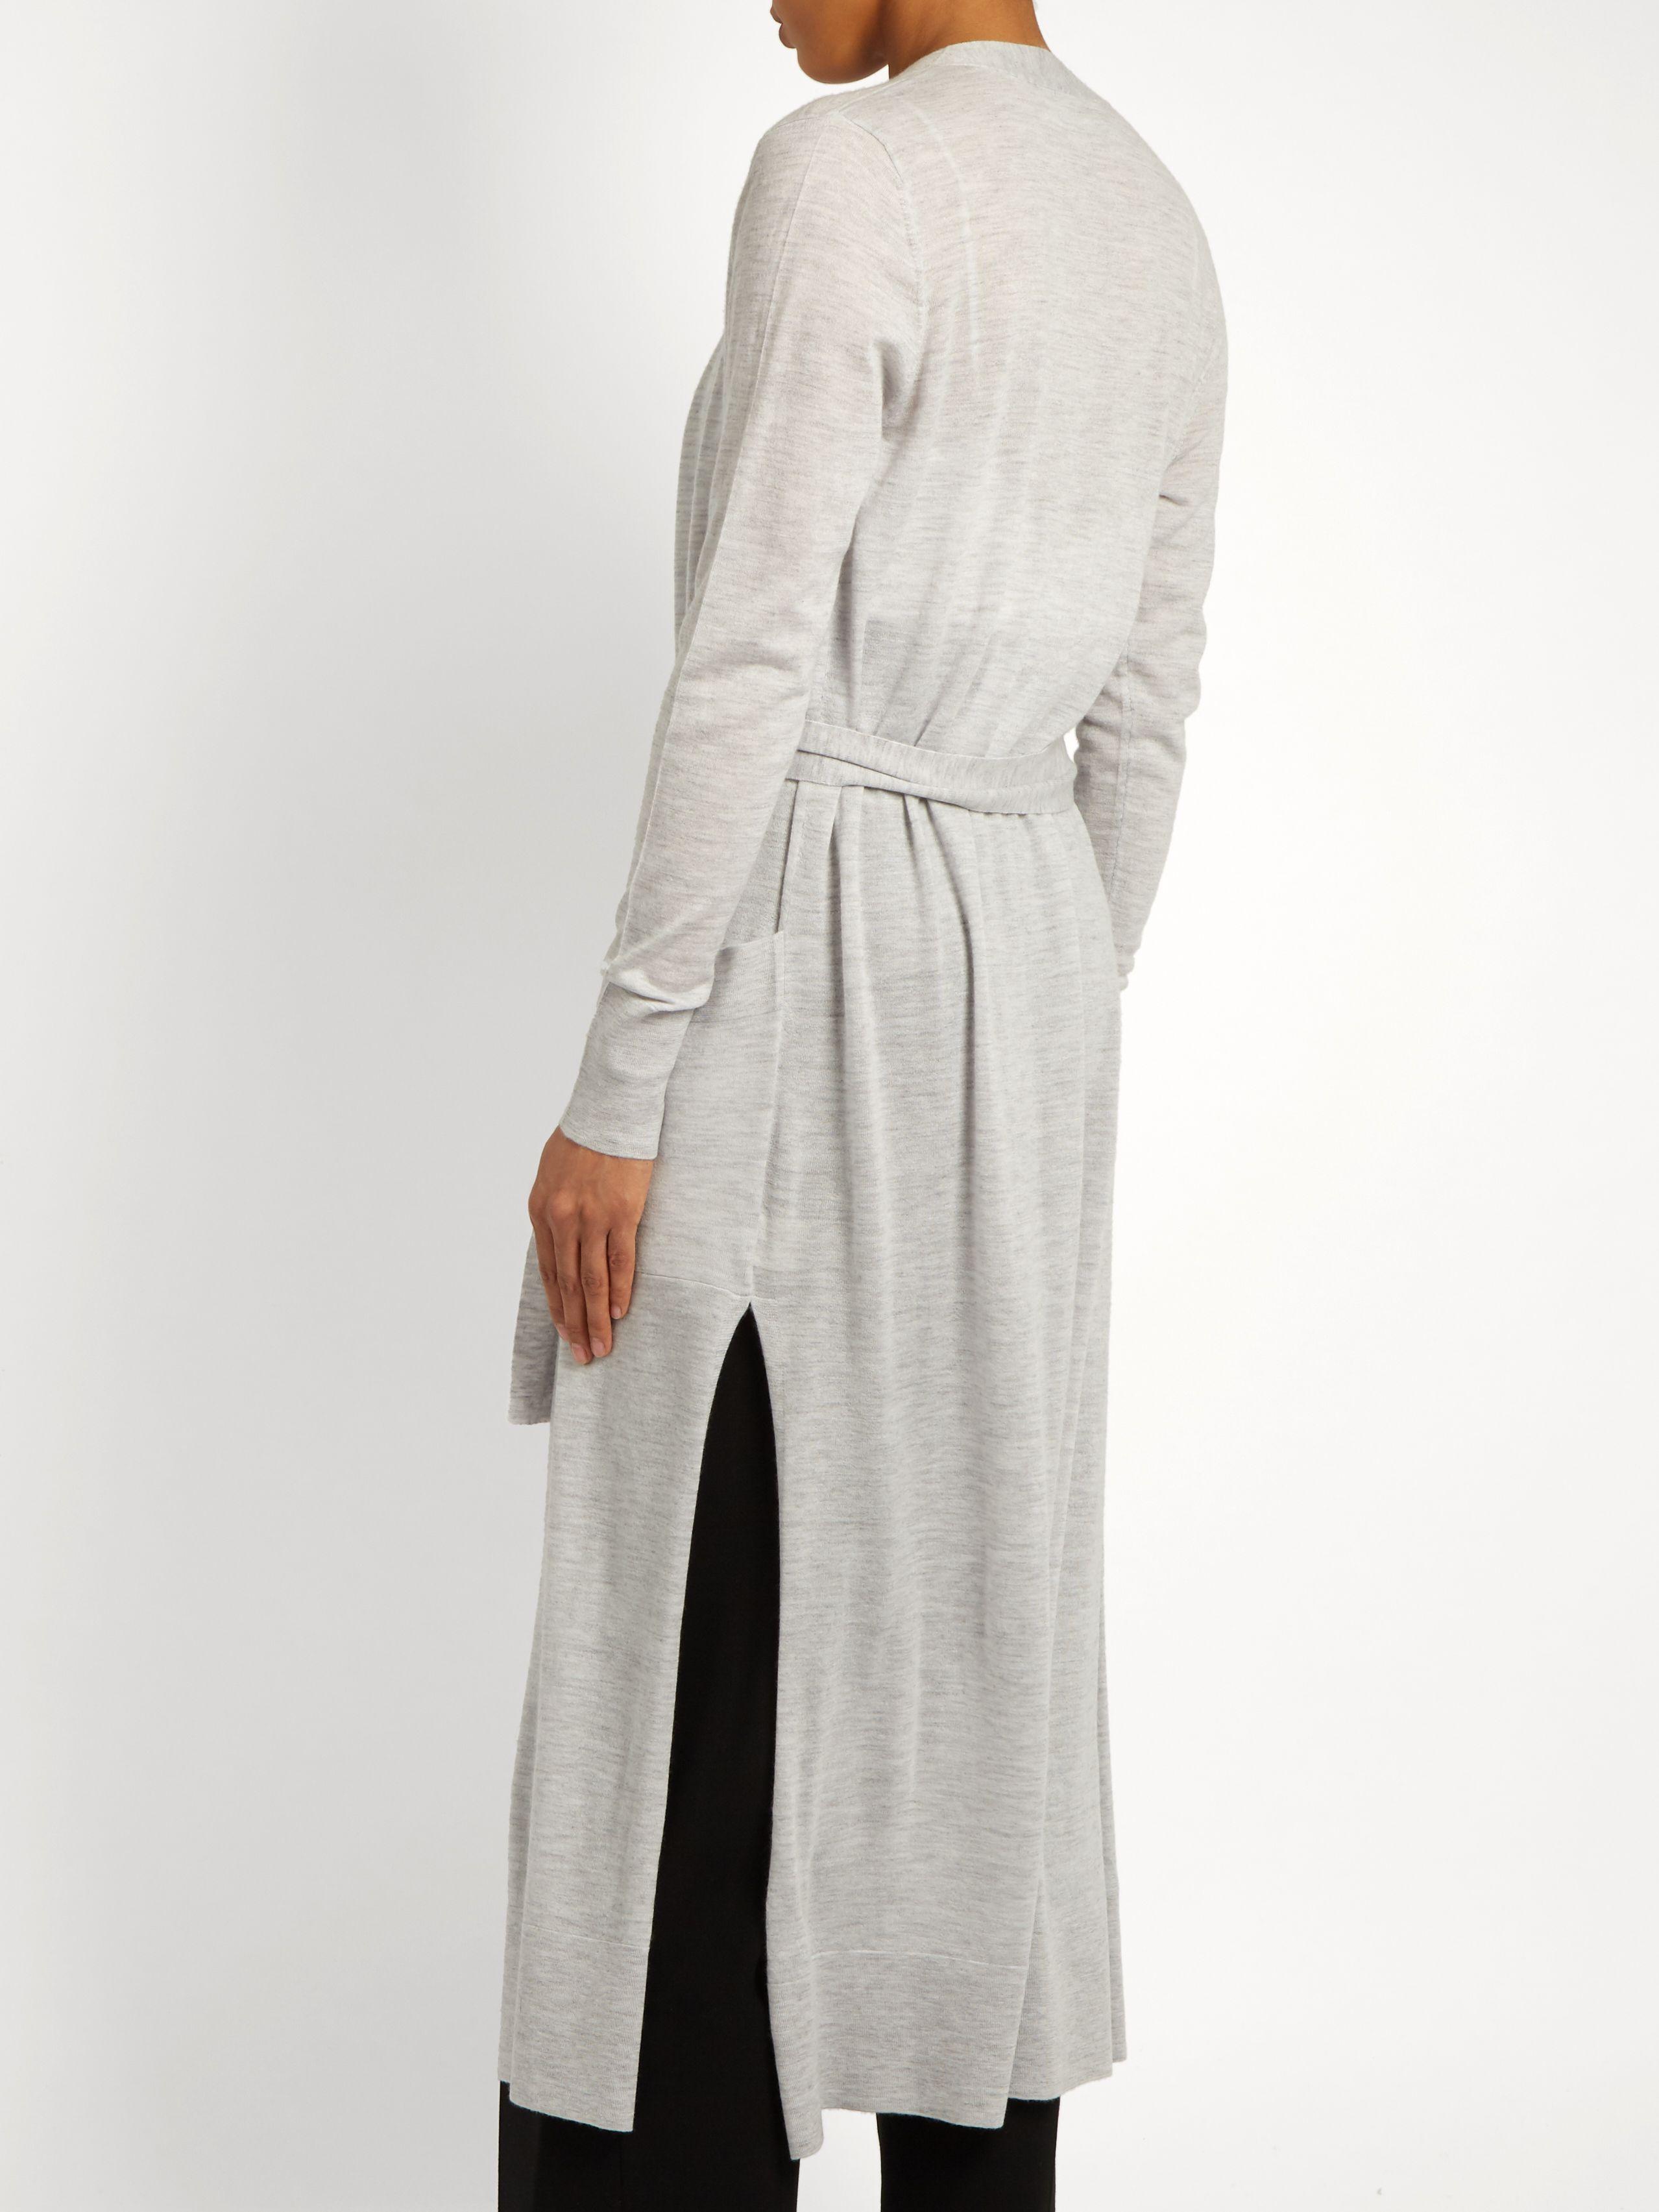 Delhi fine-knit cashmere cardigan | Le Kasha | MATCHESFASHION.COM ...